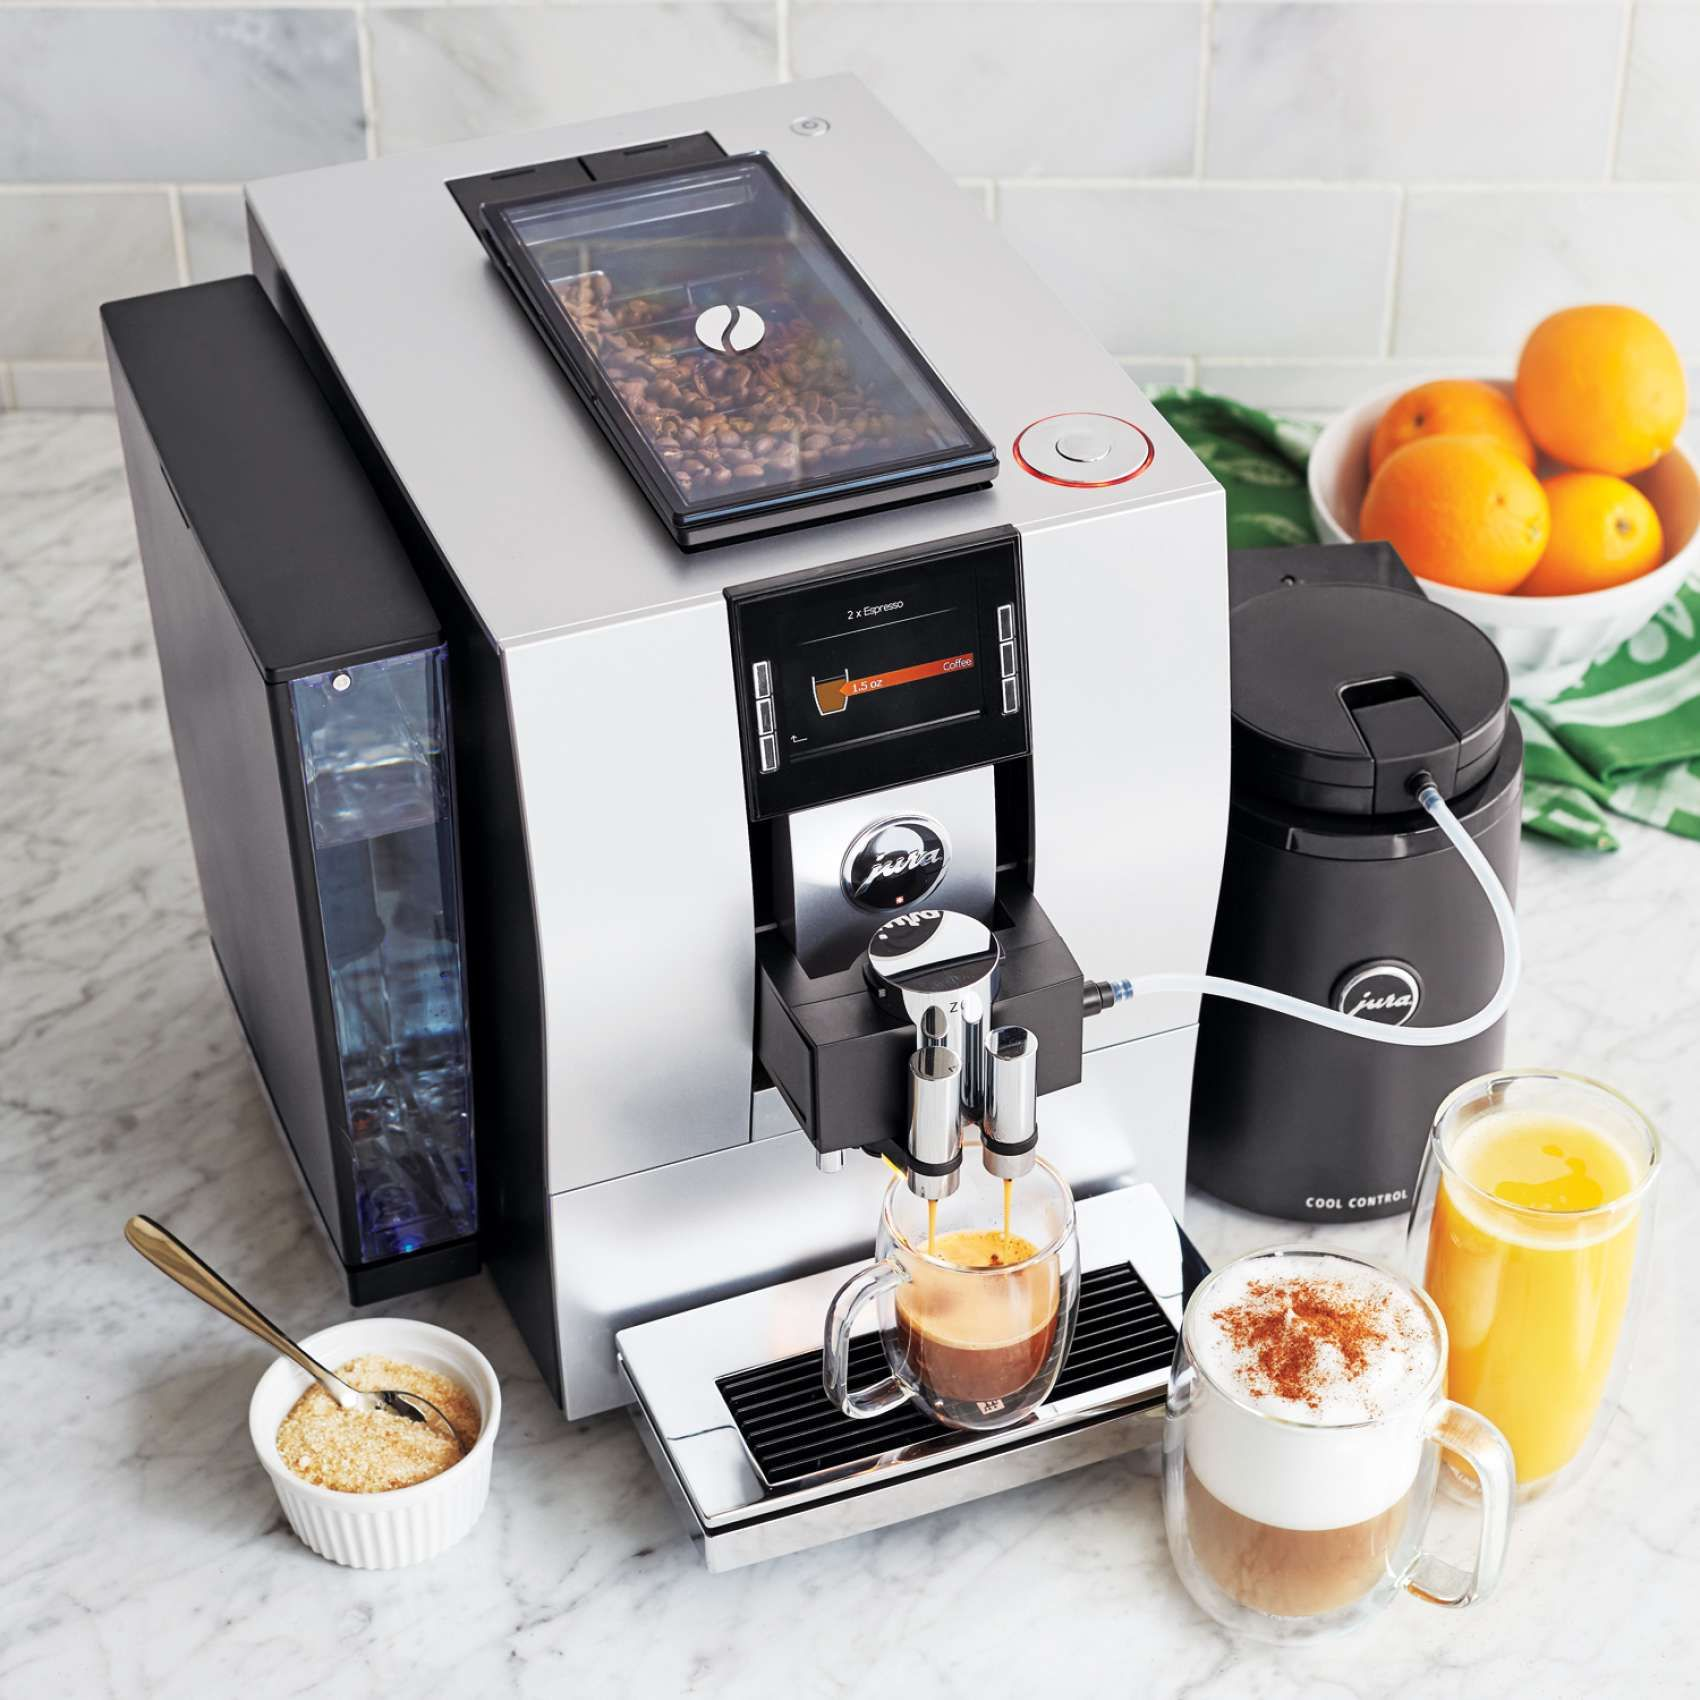 JURA Z6 Automatic Coffee Machine   Sur La Table